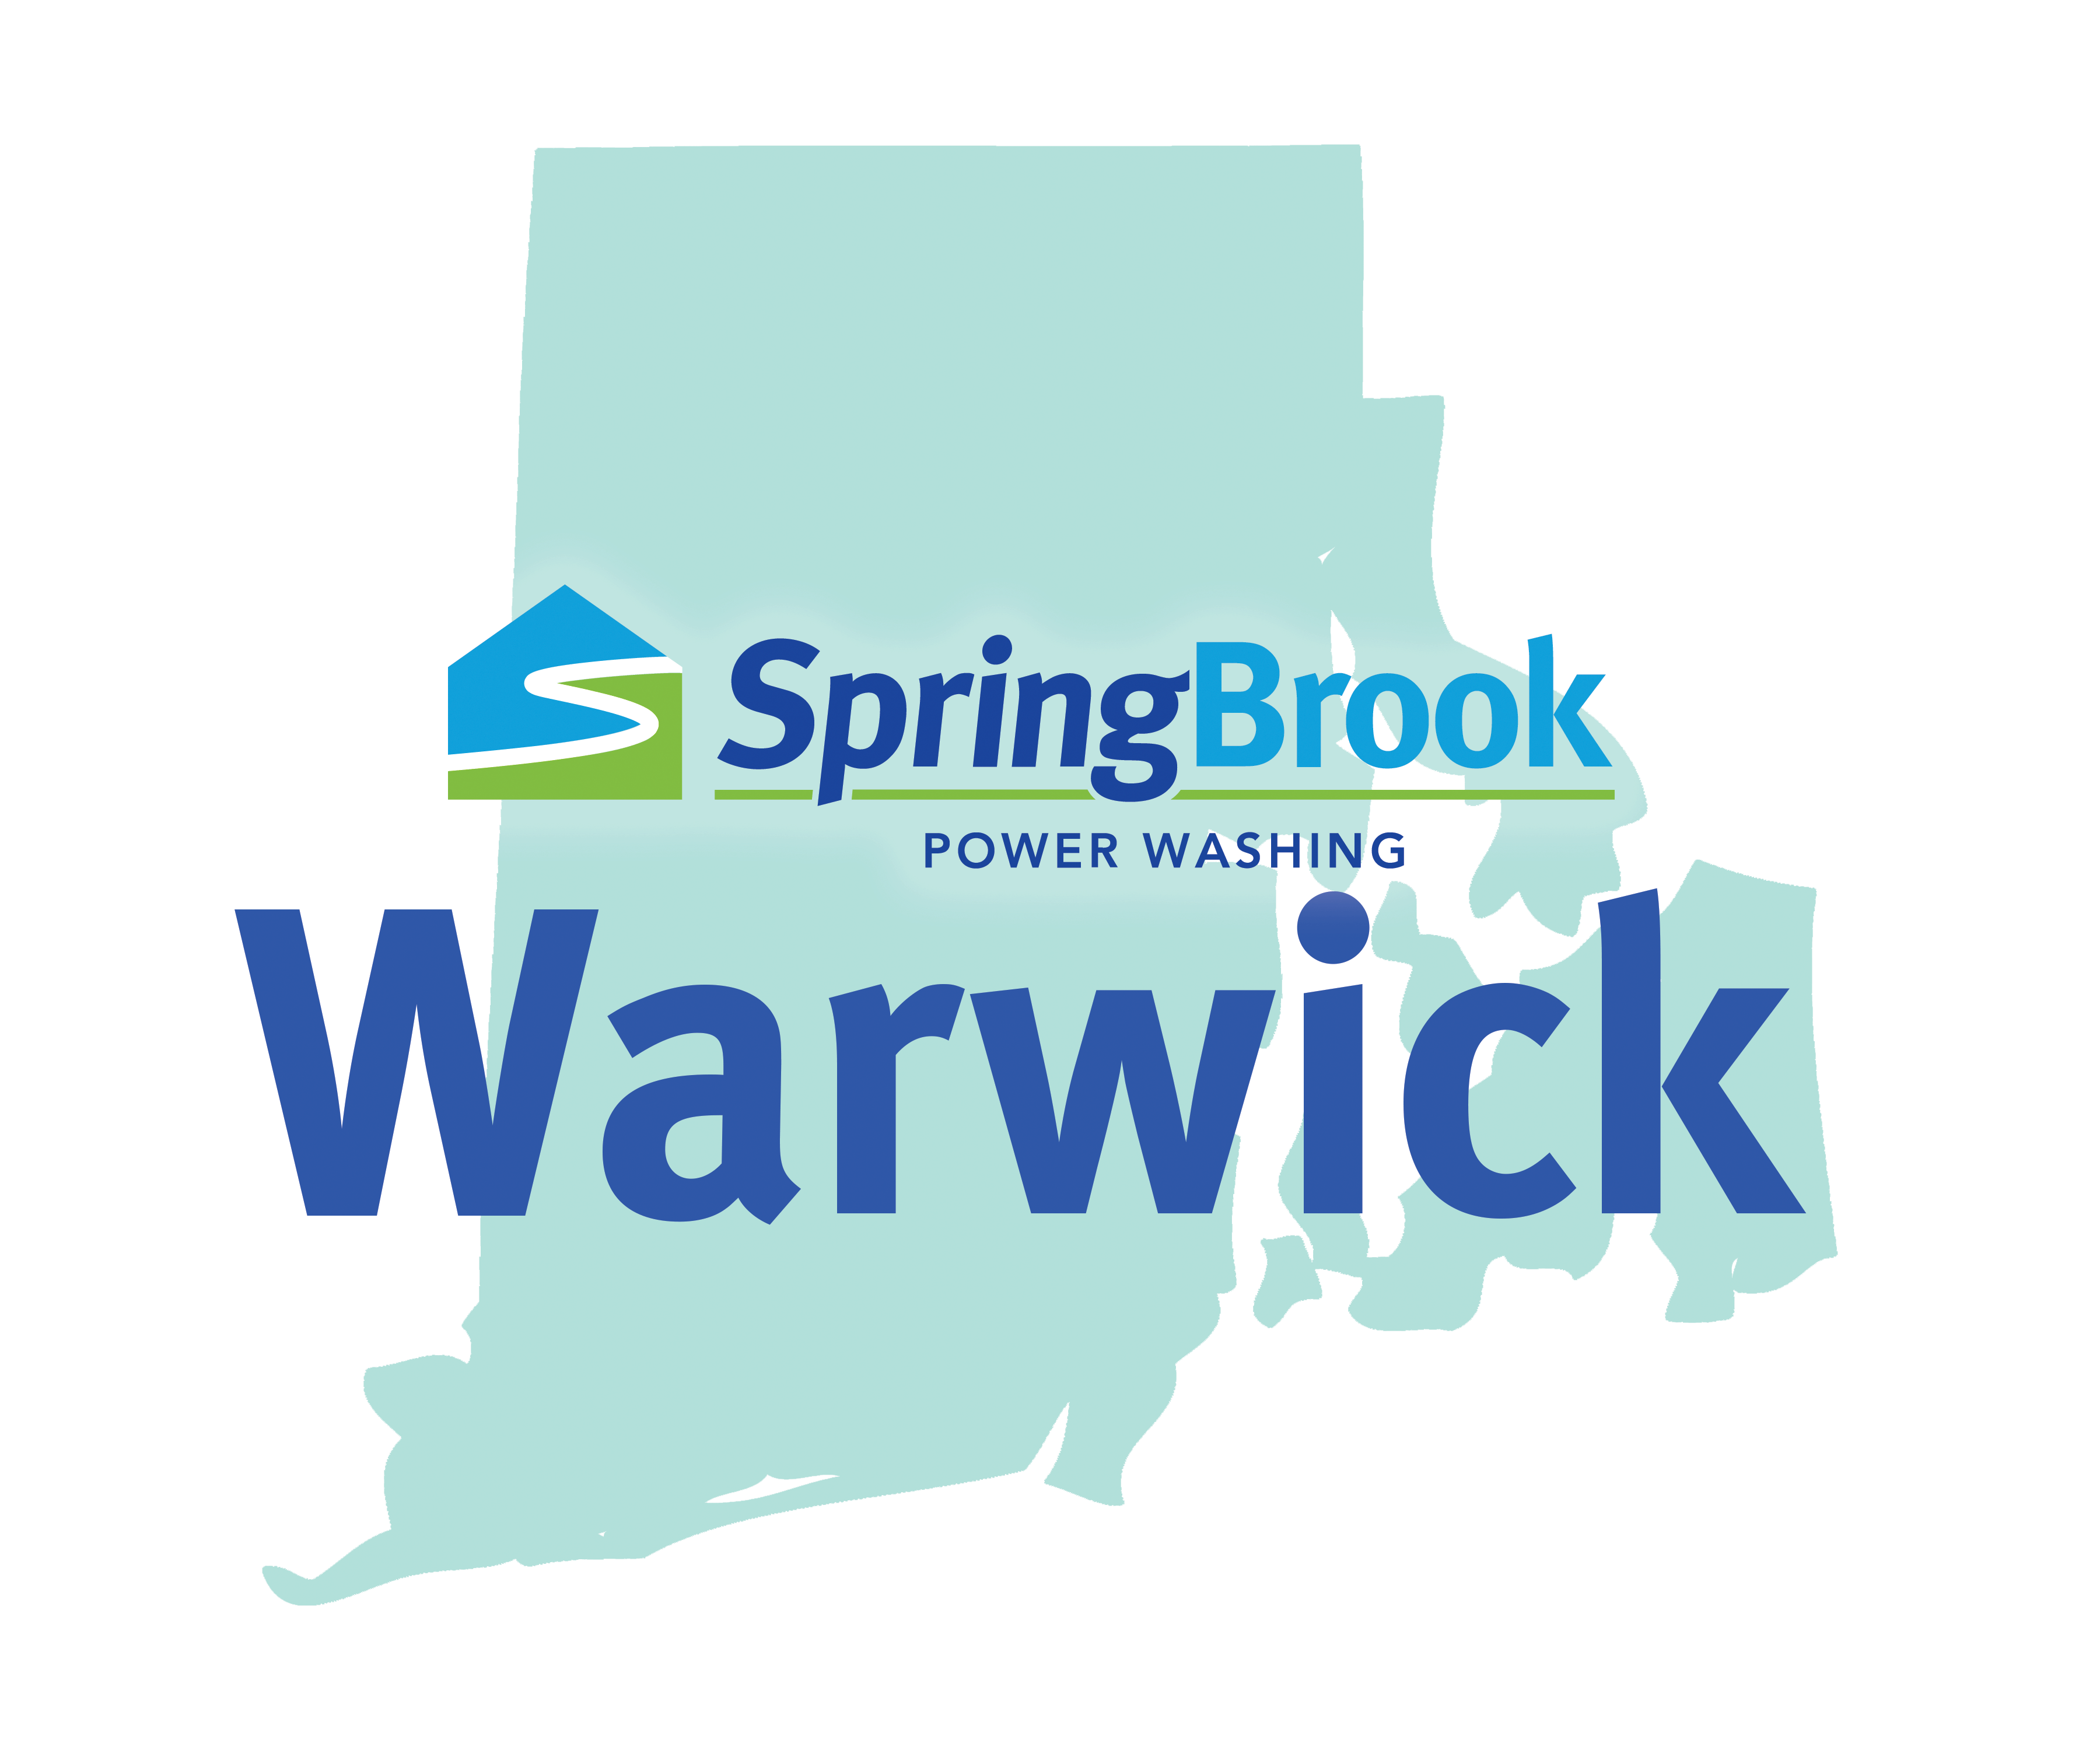 Springbrook Power Washing Warwick Rhode Island